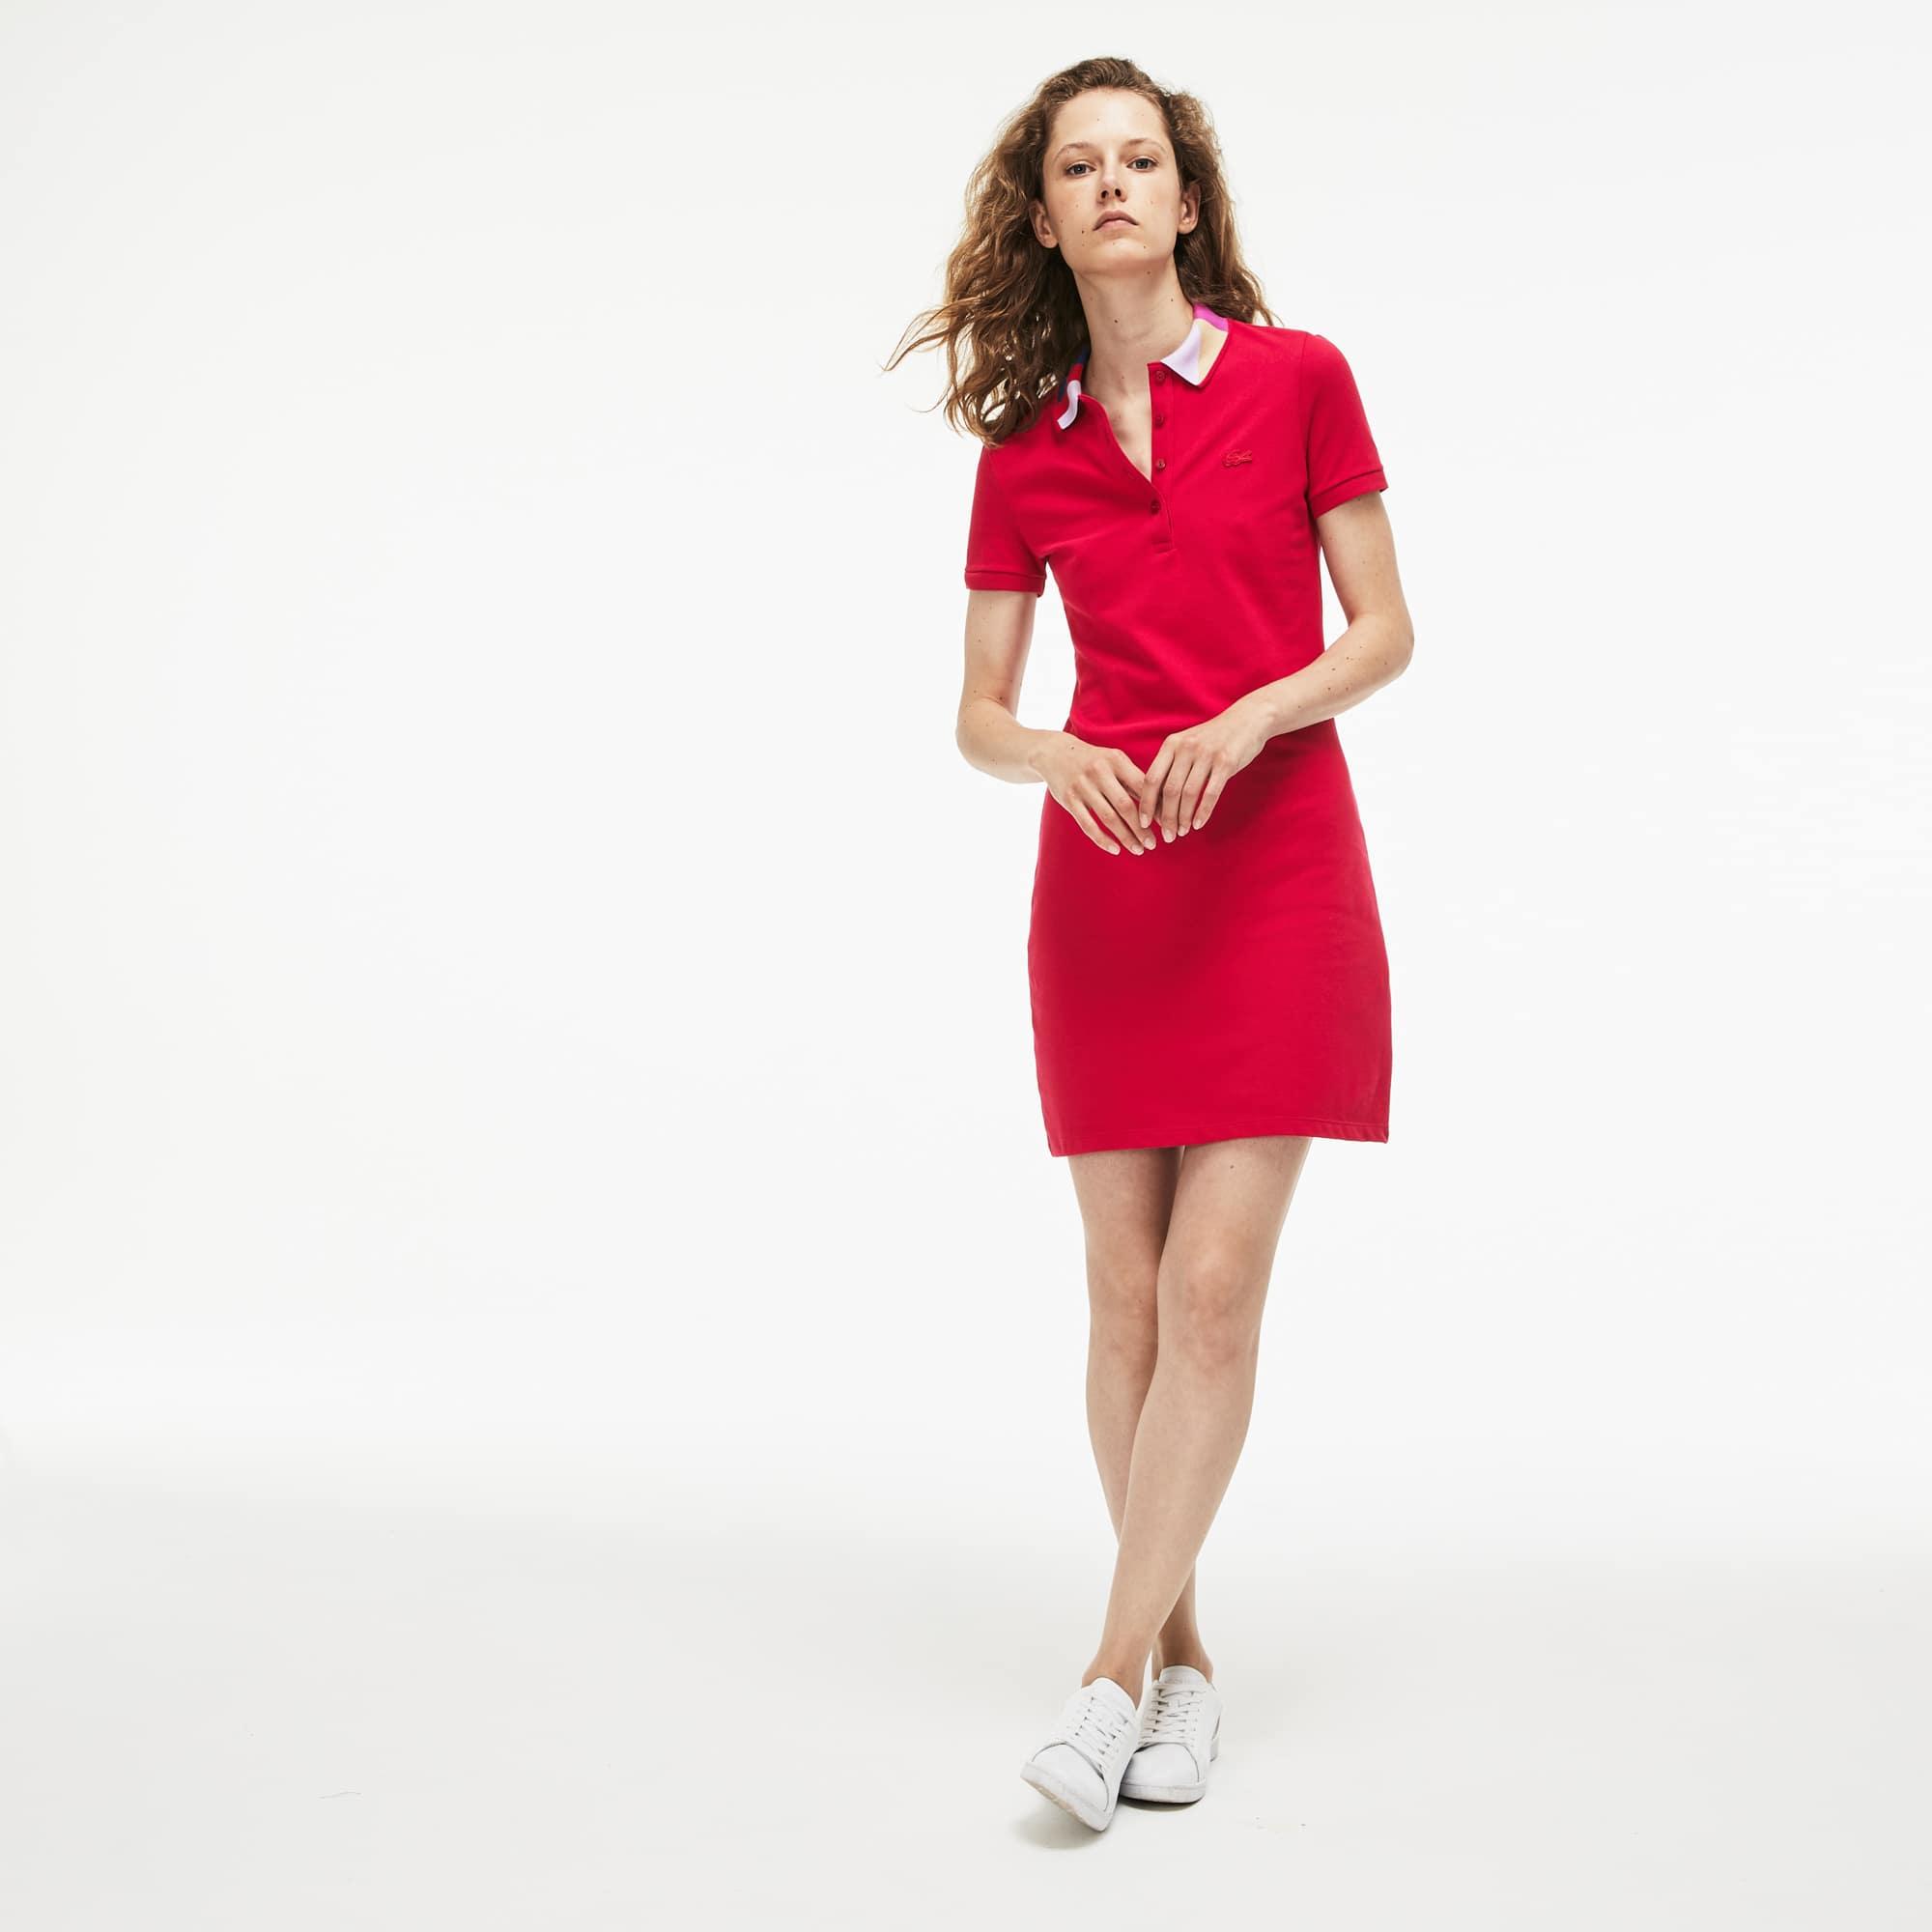 Damen Slim Fit Polokleid aus Mini-Piqué mit Colorblocks